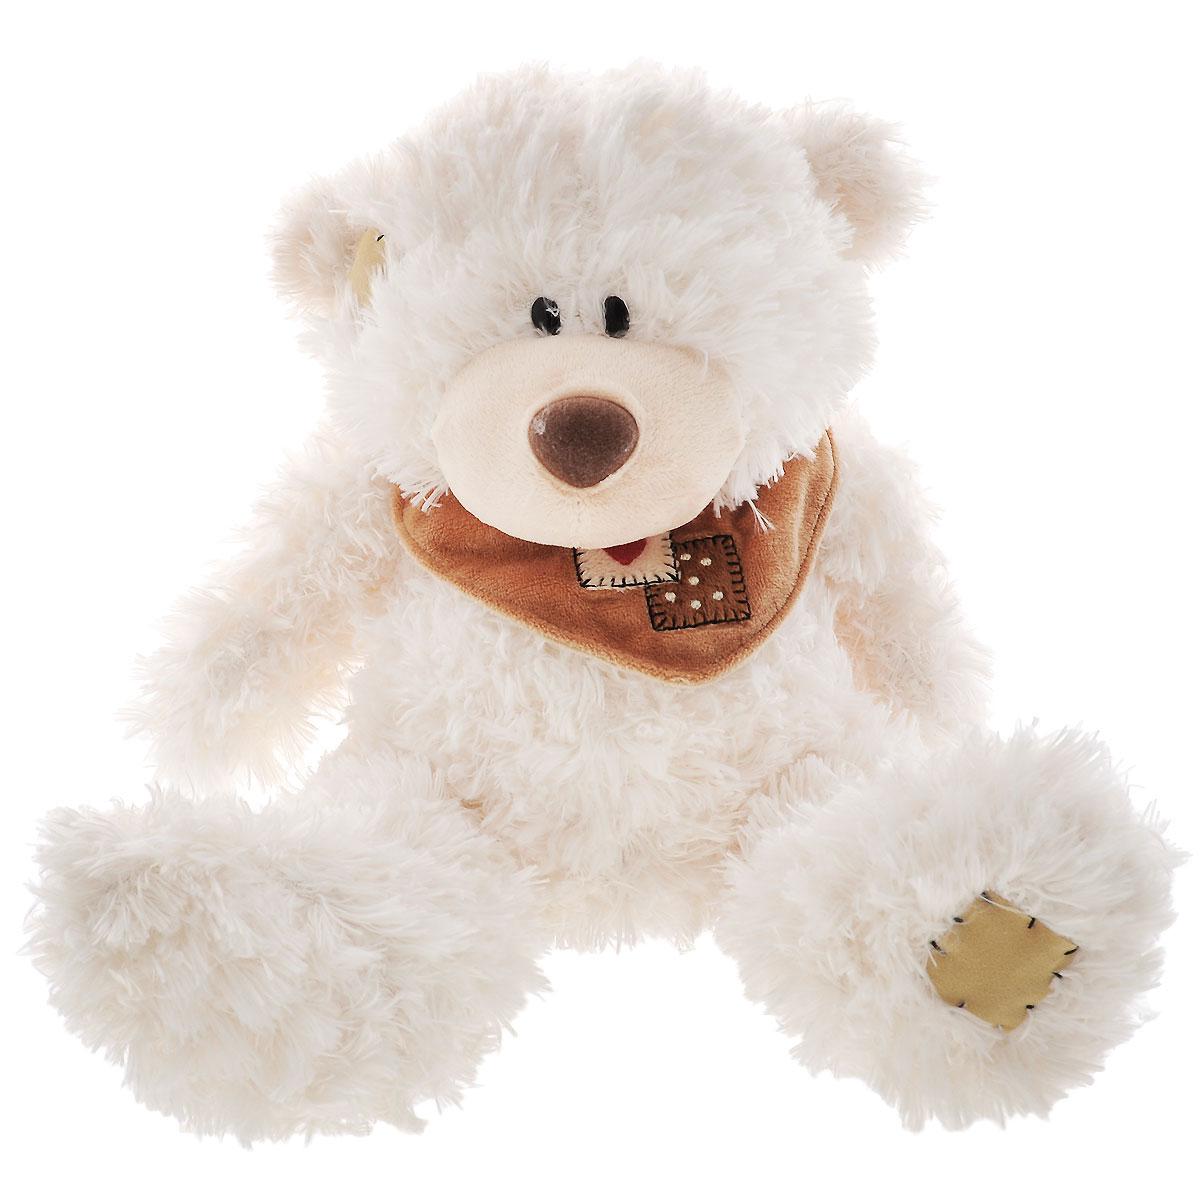 Plush Apple Мягкая игрушка Белый медведь с шарфом, 25 см panno utki 3d model relief figure stl format the duck 3d model relief for cnc in stl file format